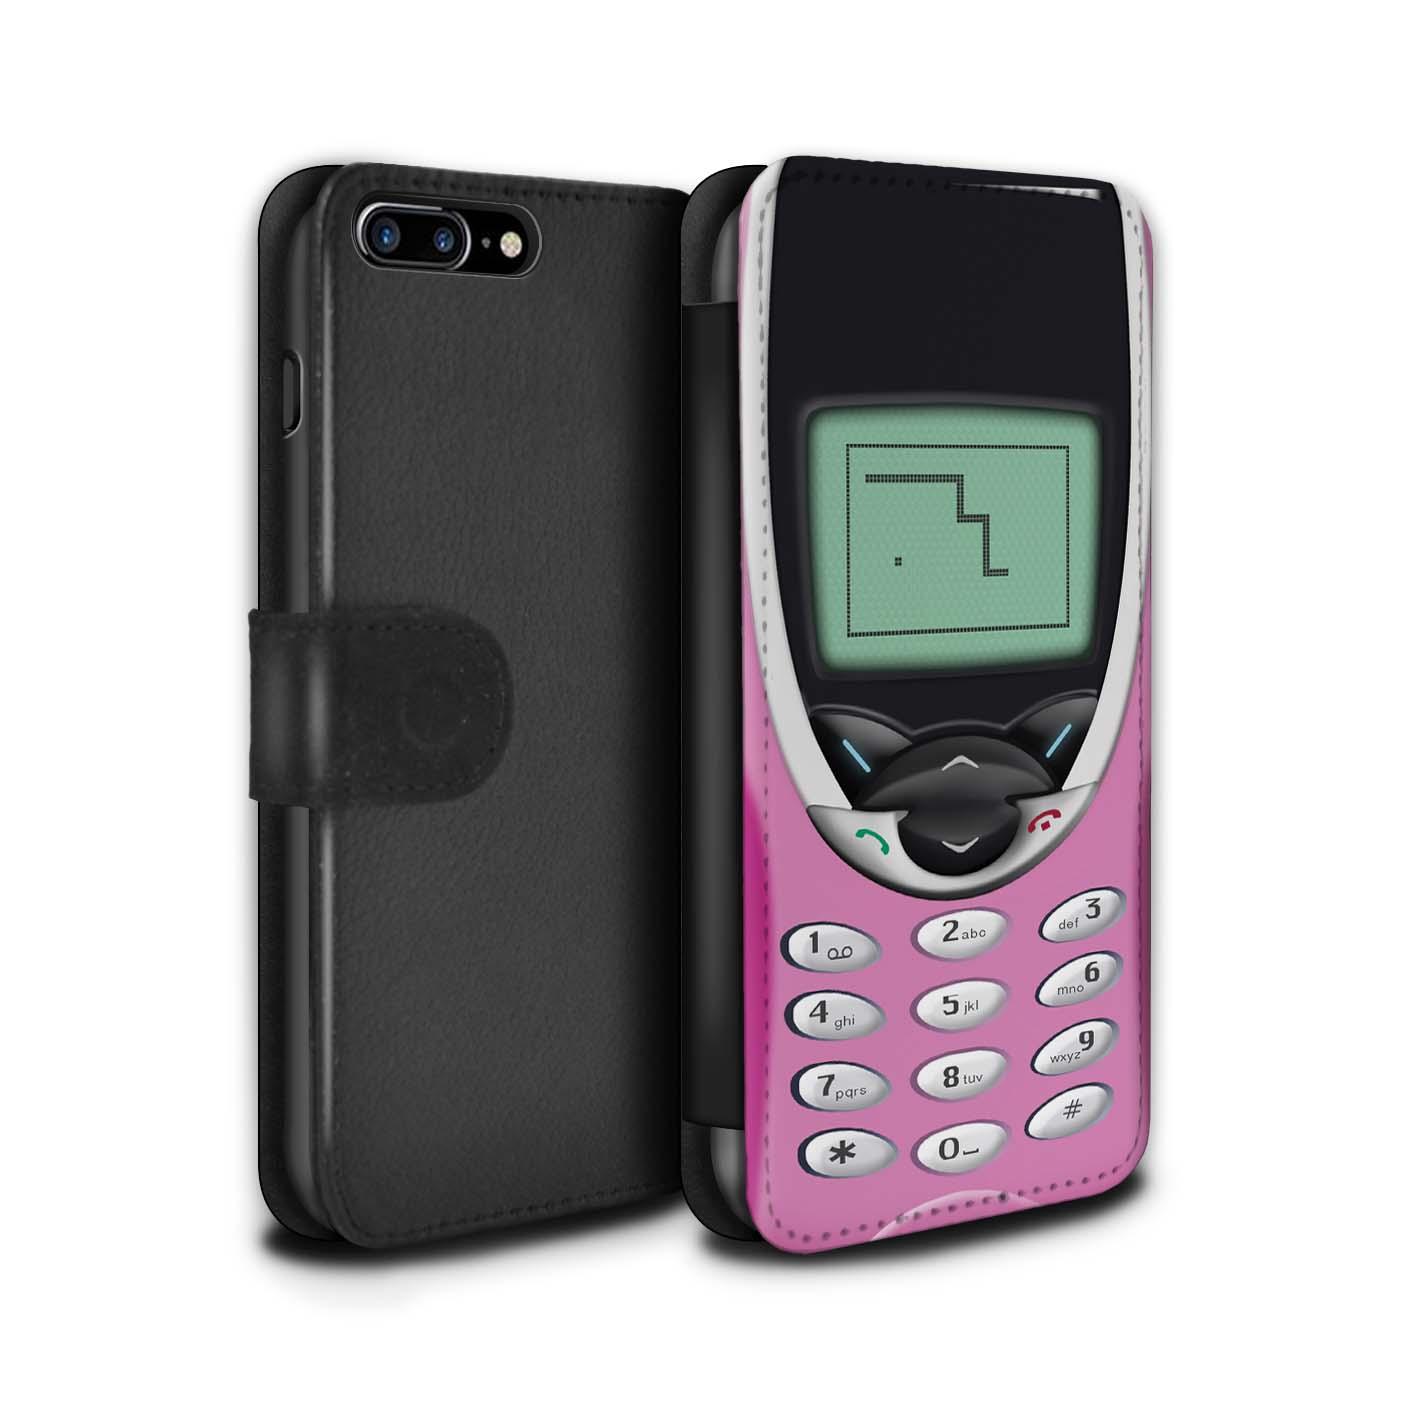 STUFF4-Coque-Etui-Case-Cuir-PU-pour-Apple-iPhone-8-Plus-Portables-retro